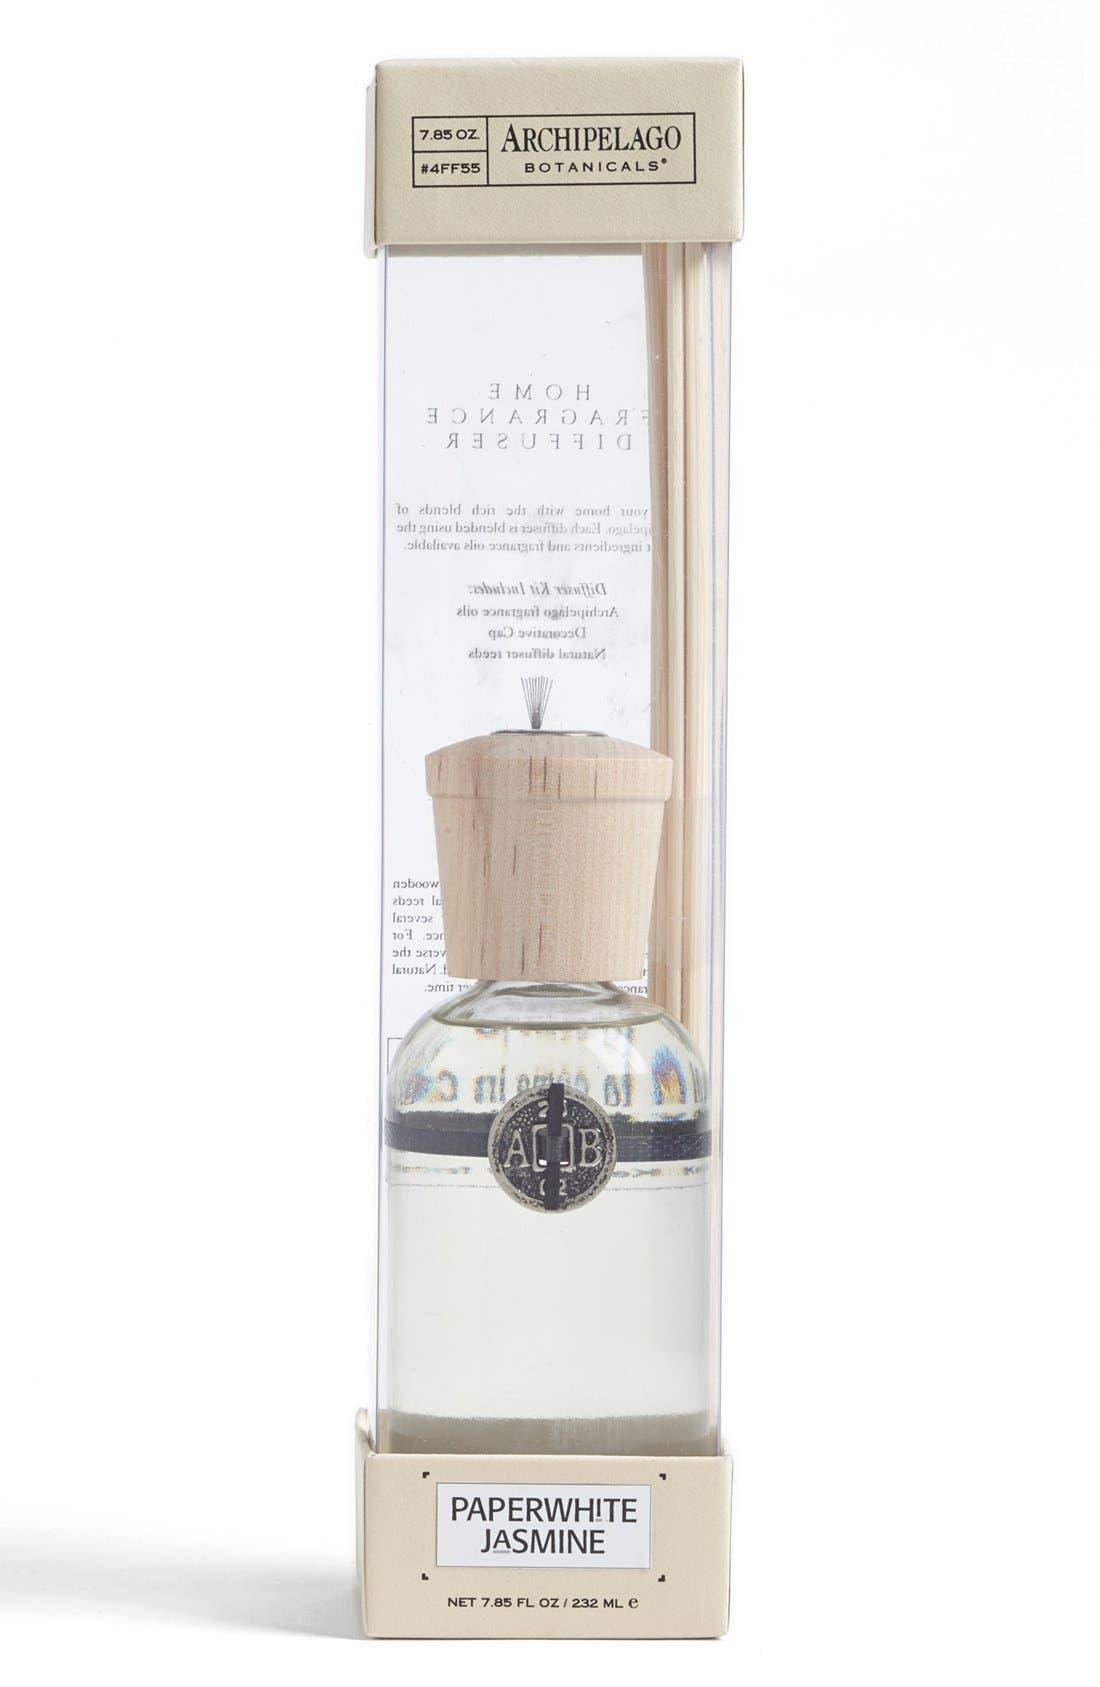 Main Image - Archipelago Botanicals 'Paperwhite Jasmine' Fragrance Diffuser (Special Purchase)